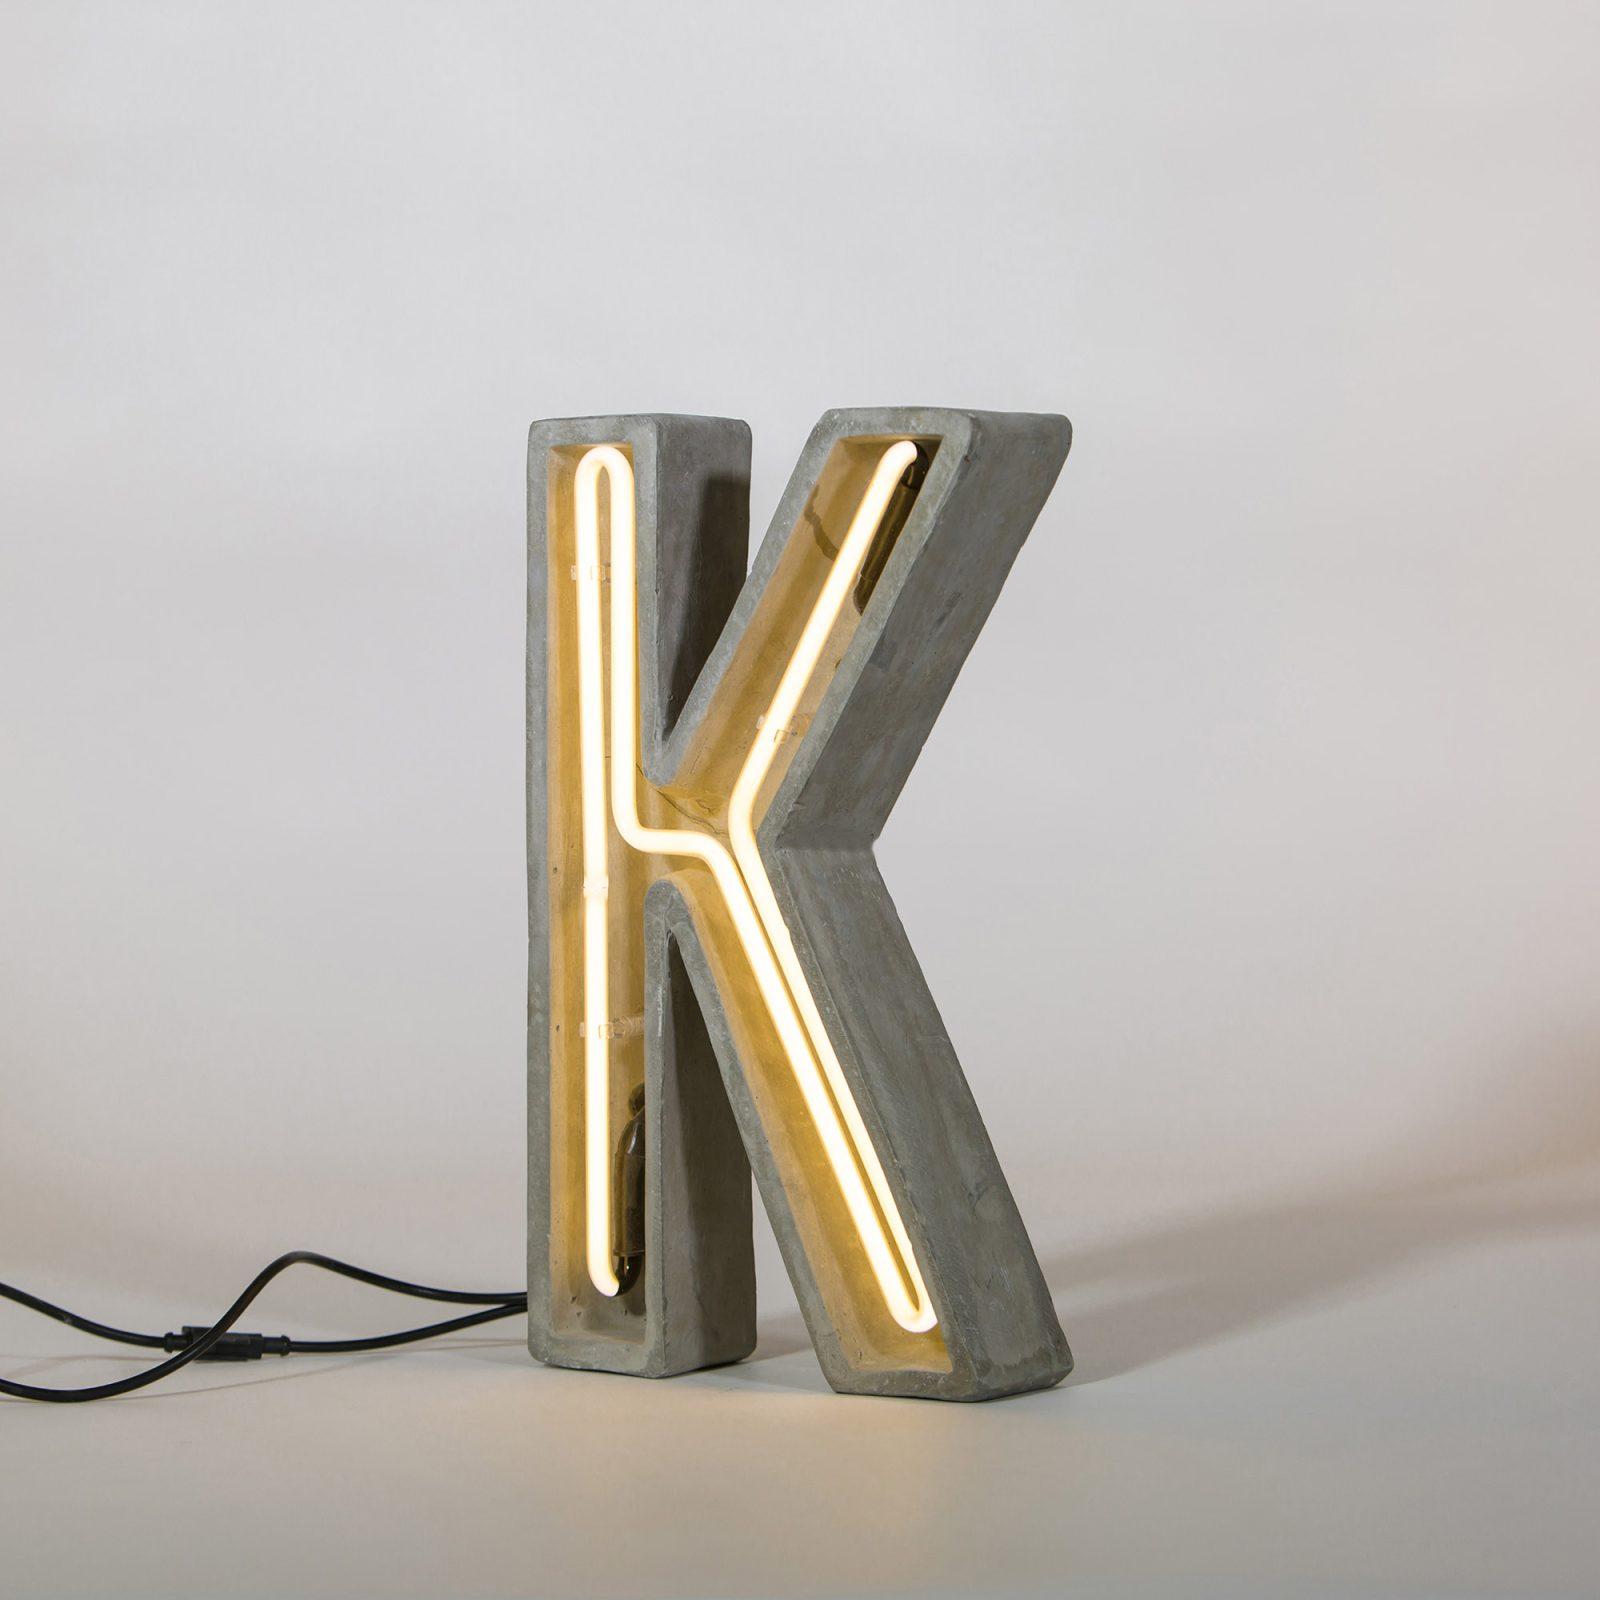 Alphacrete, Concrete Neon Light – K-32304